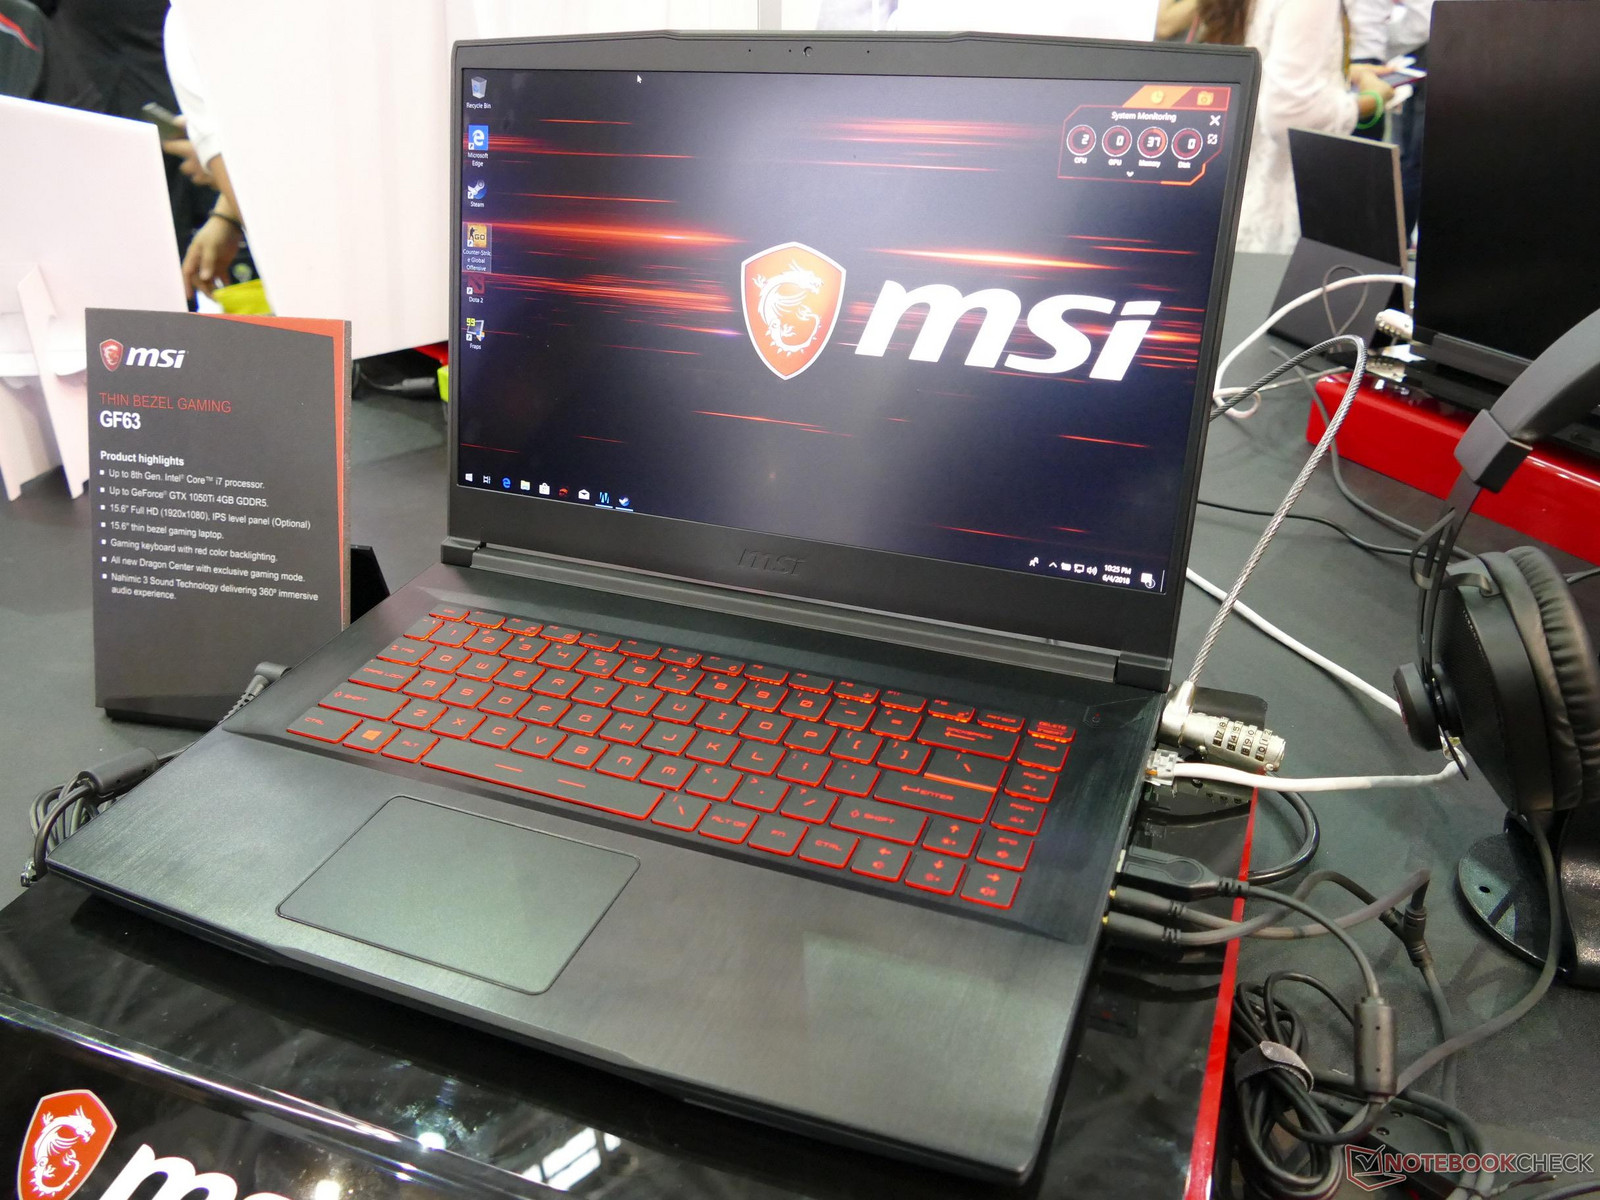 MSI showcases budget GF63 gaming laptop - NotebookCheck net News